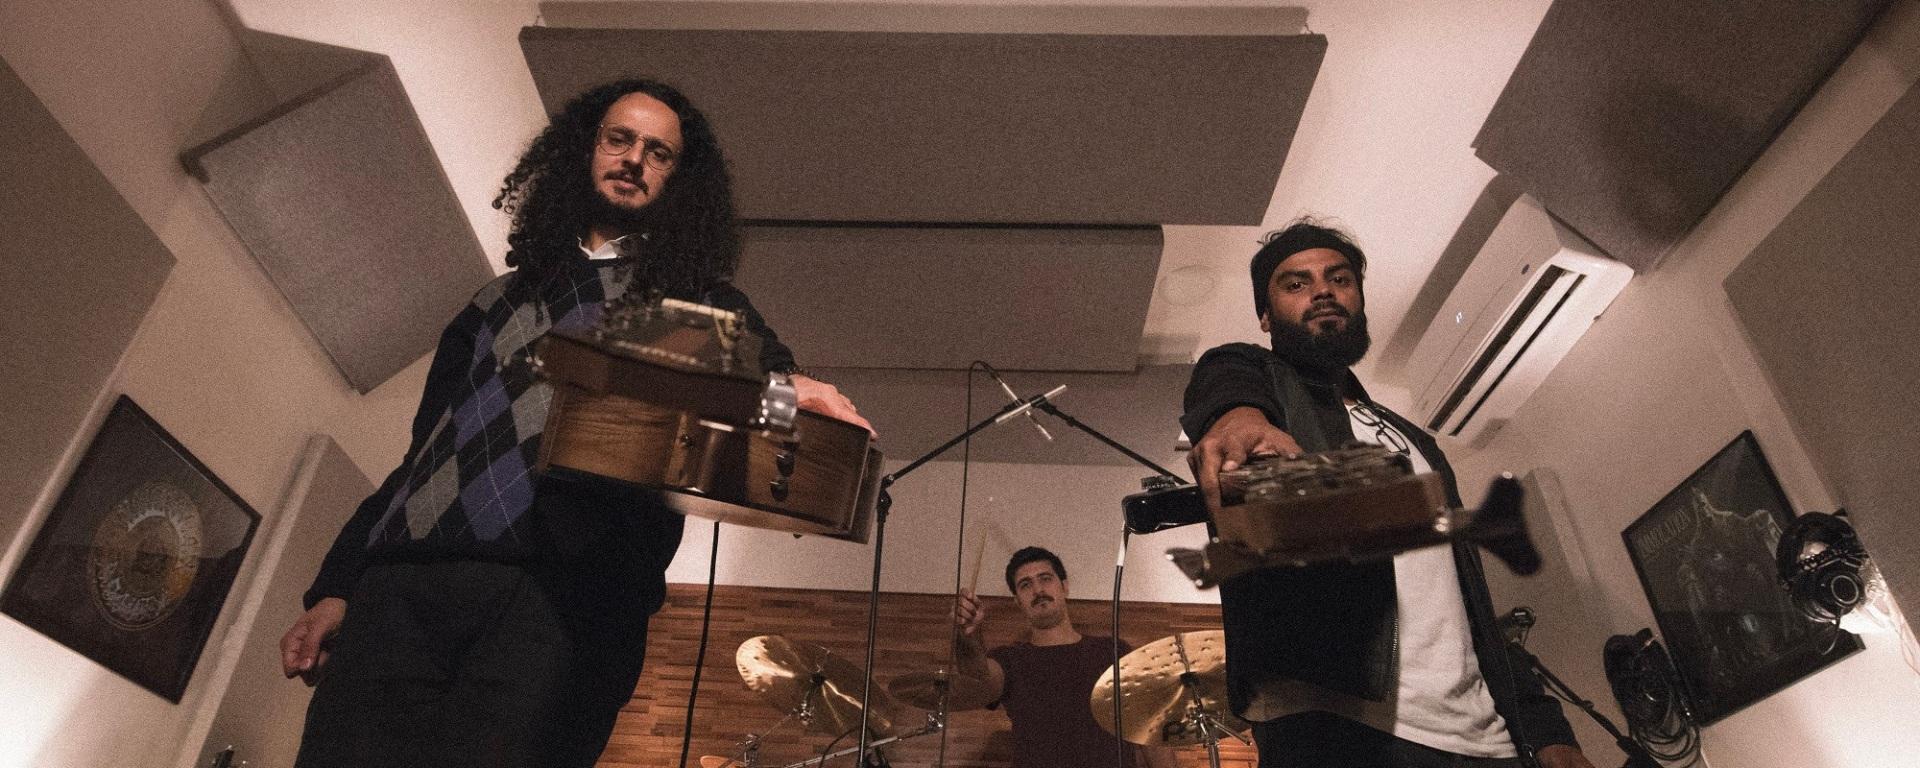 "Saudi Arabian Prog Rockers SONGS OF PETRICHOR Debut Single ""Nomad"" Off Upcoming 2021 Album"